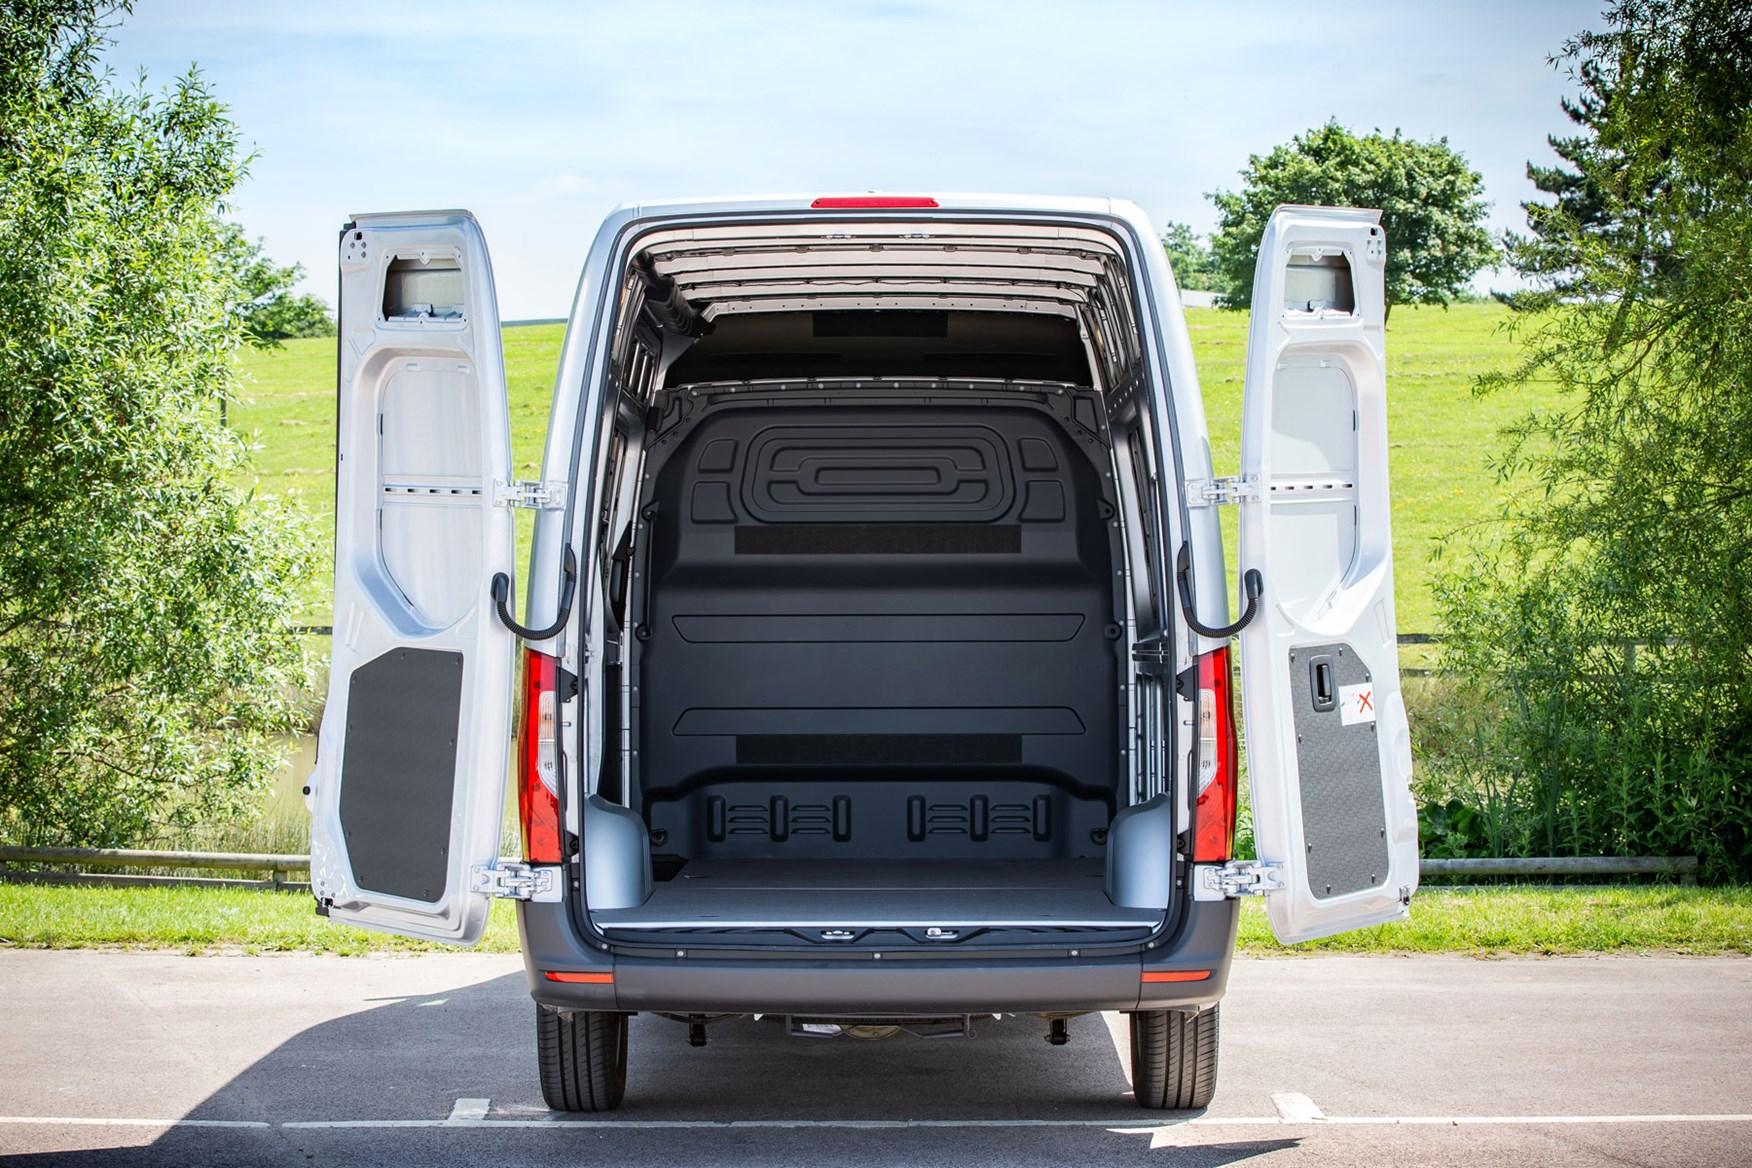 Mercedes Sprinter (2018-on), rear doors open, load area